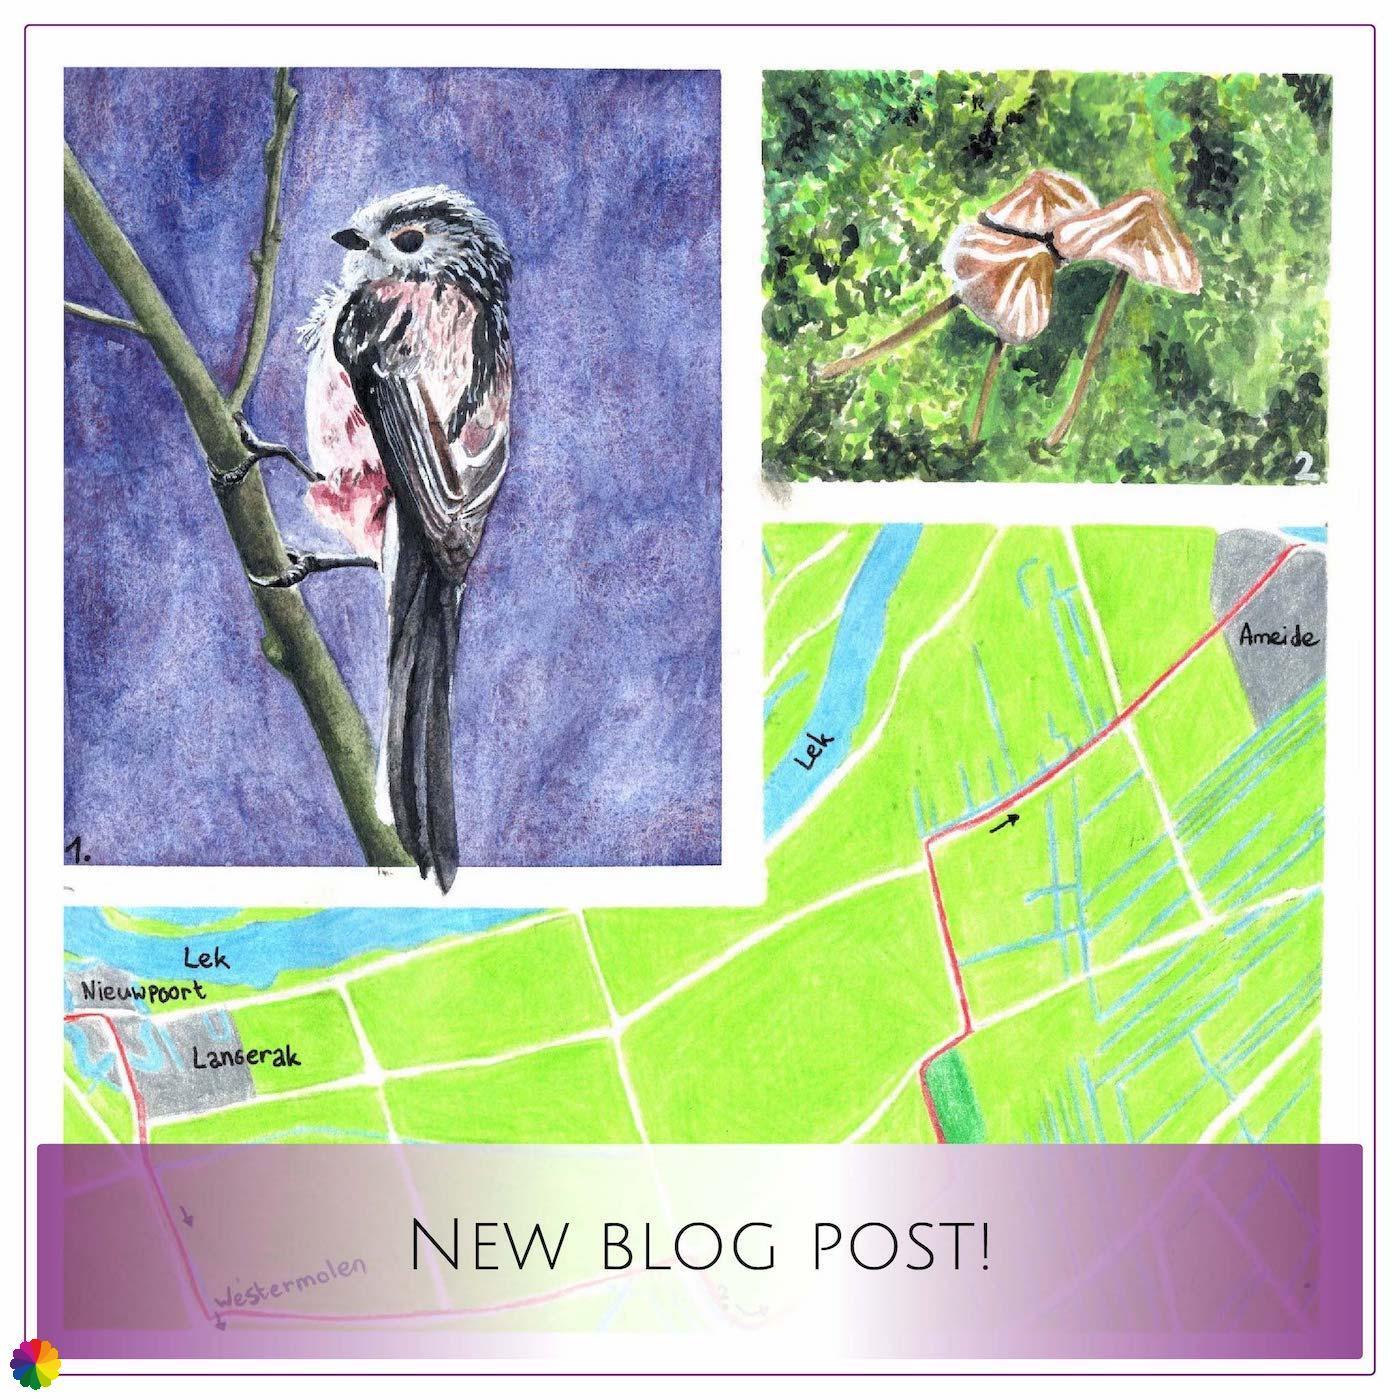 Blog update Great rivers trail Nieuwpoort - Ameide